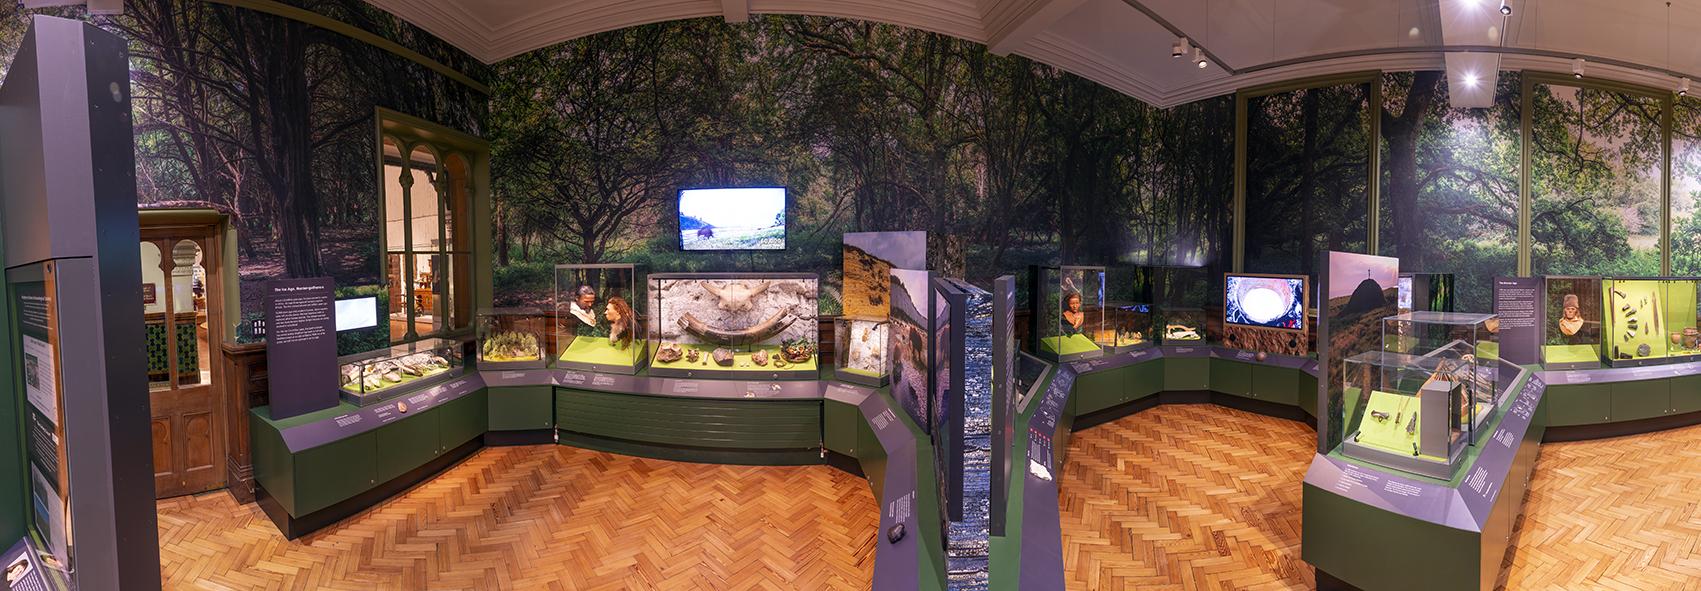 Archaeology Room-03.jpg